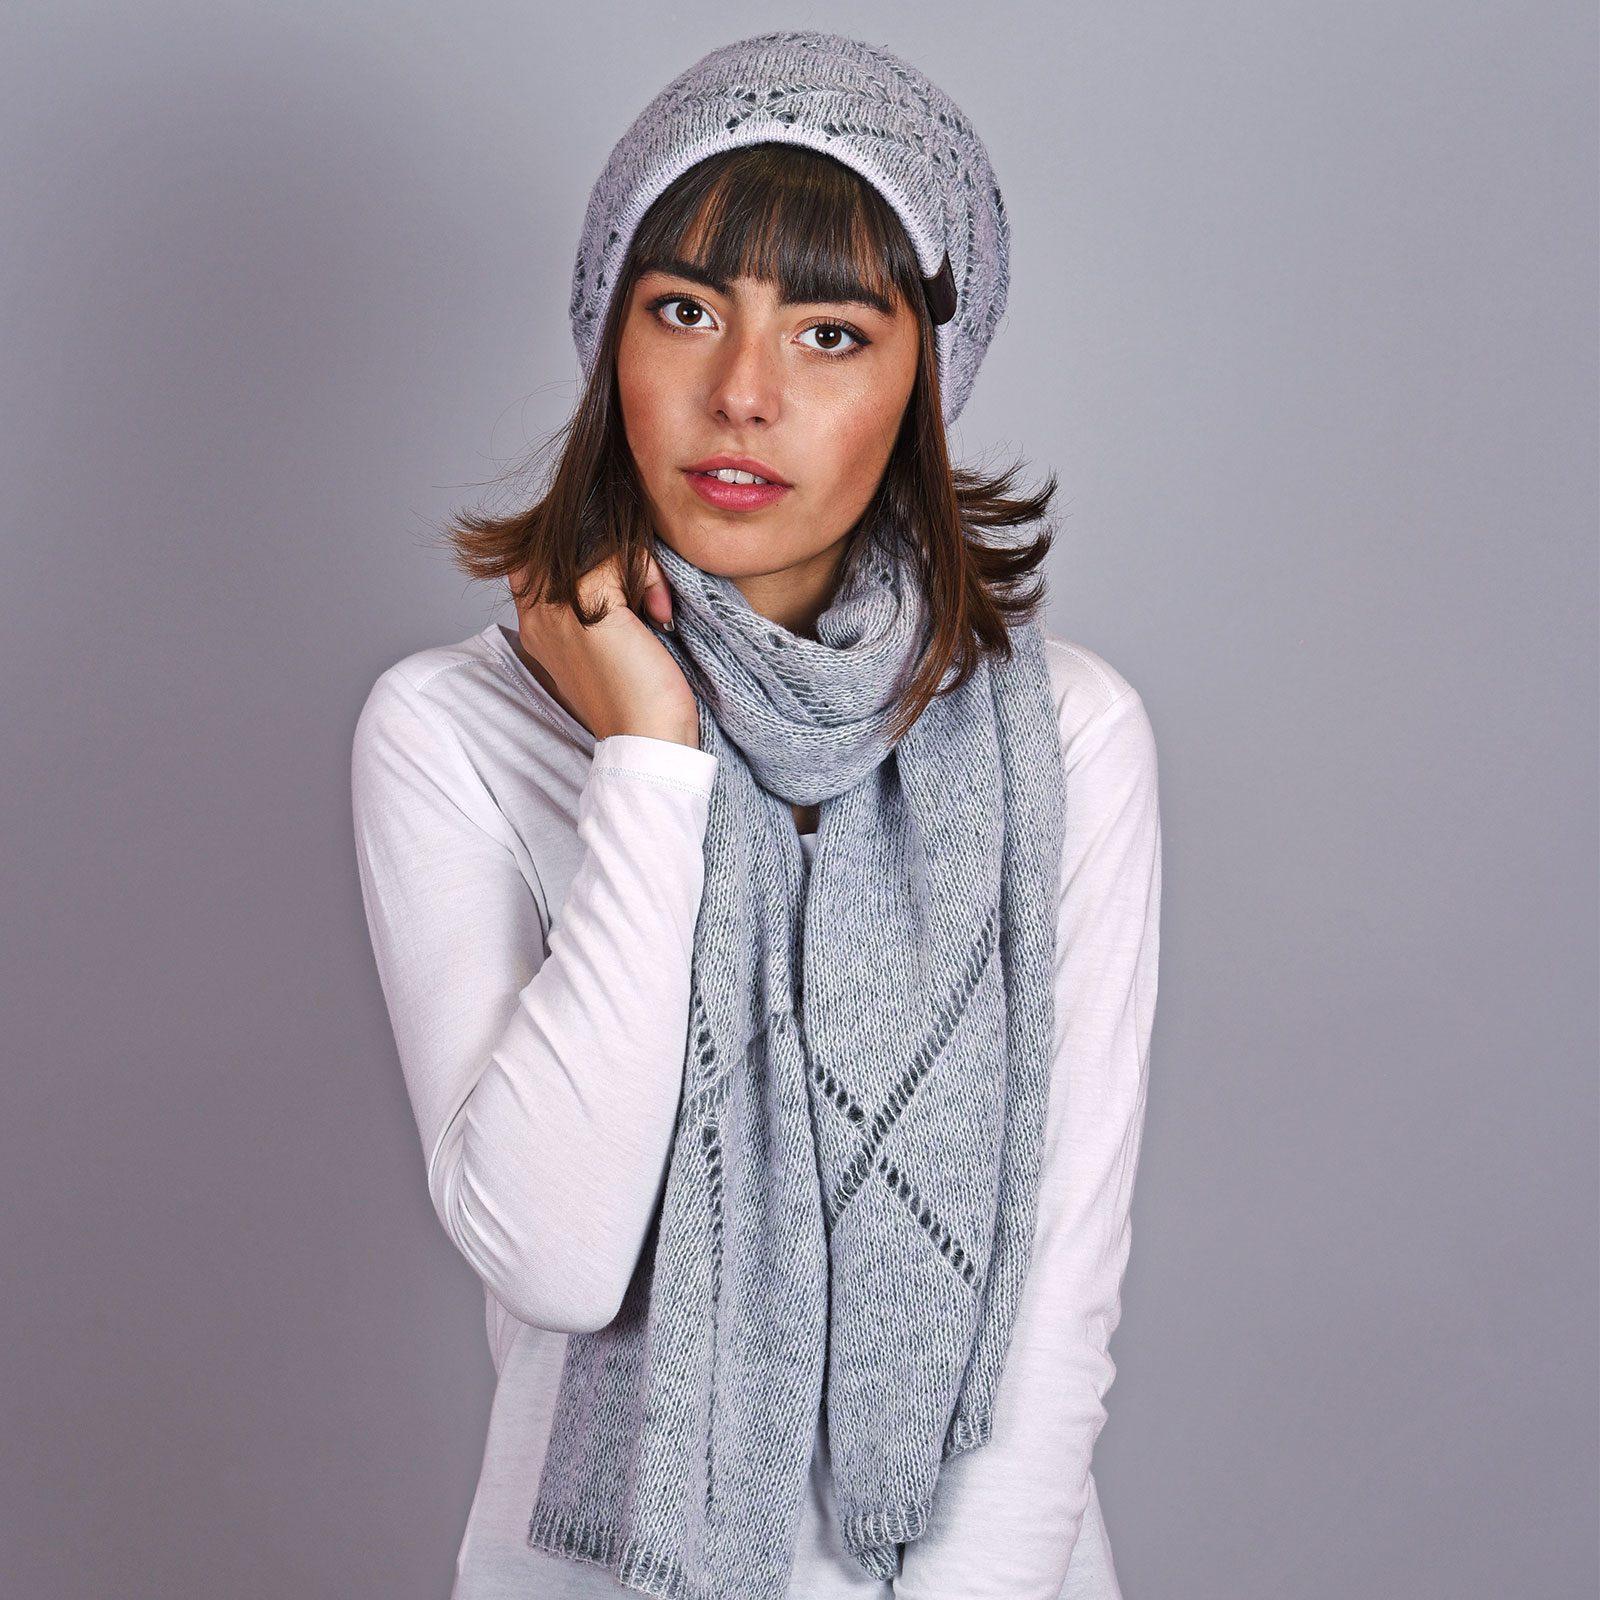 http://lookbook.allee-du-foulard.fr/wp-content/uploads/2019/01/AT-04597-VF16-1600x1600.jpg